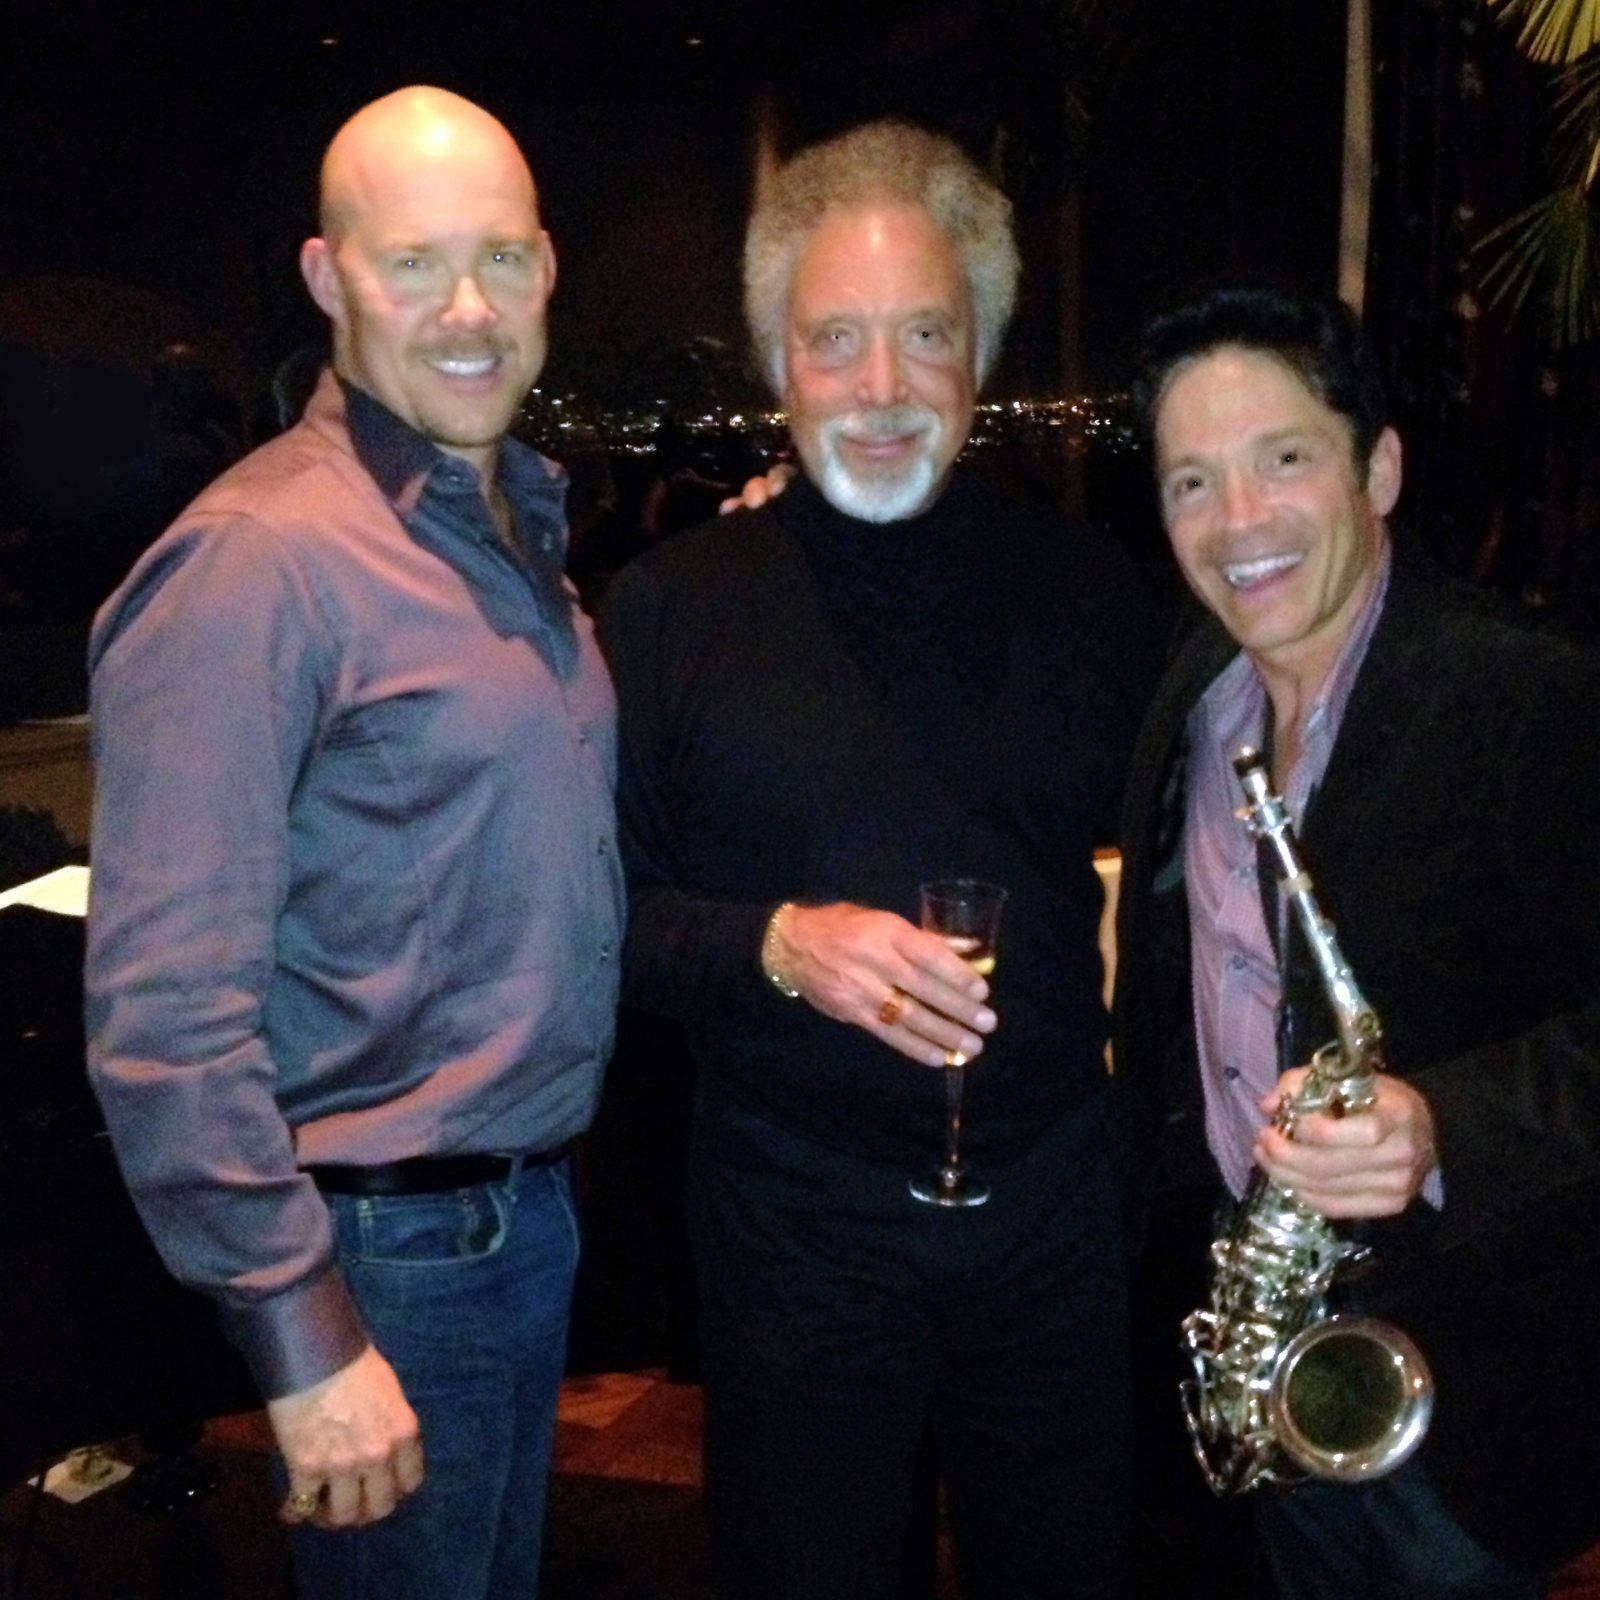 Todd with Tom Jones & Dave Koz